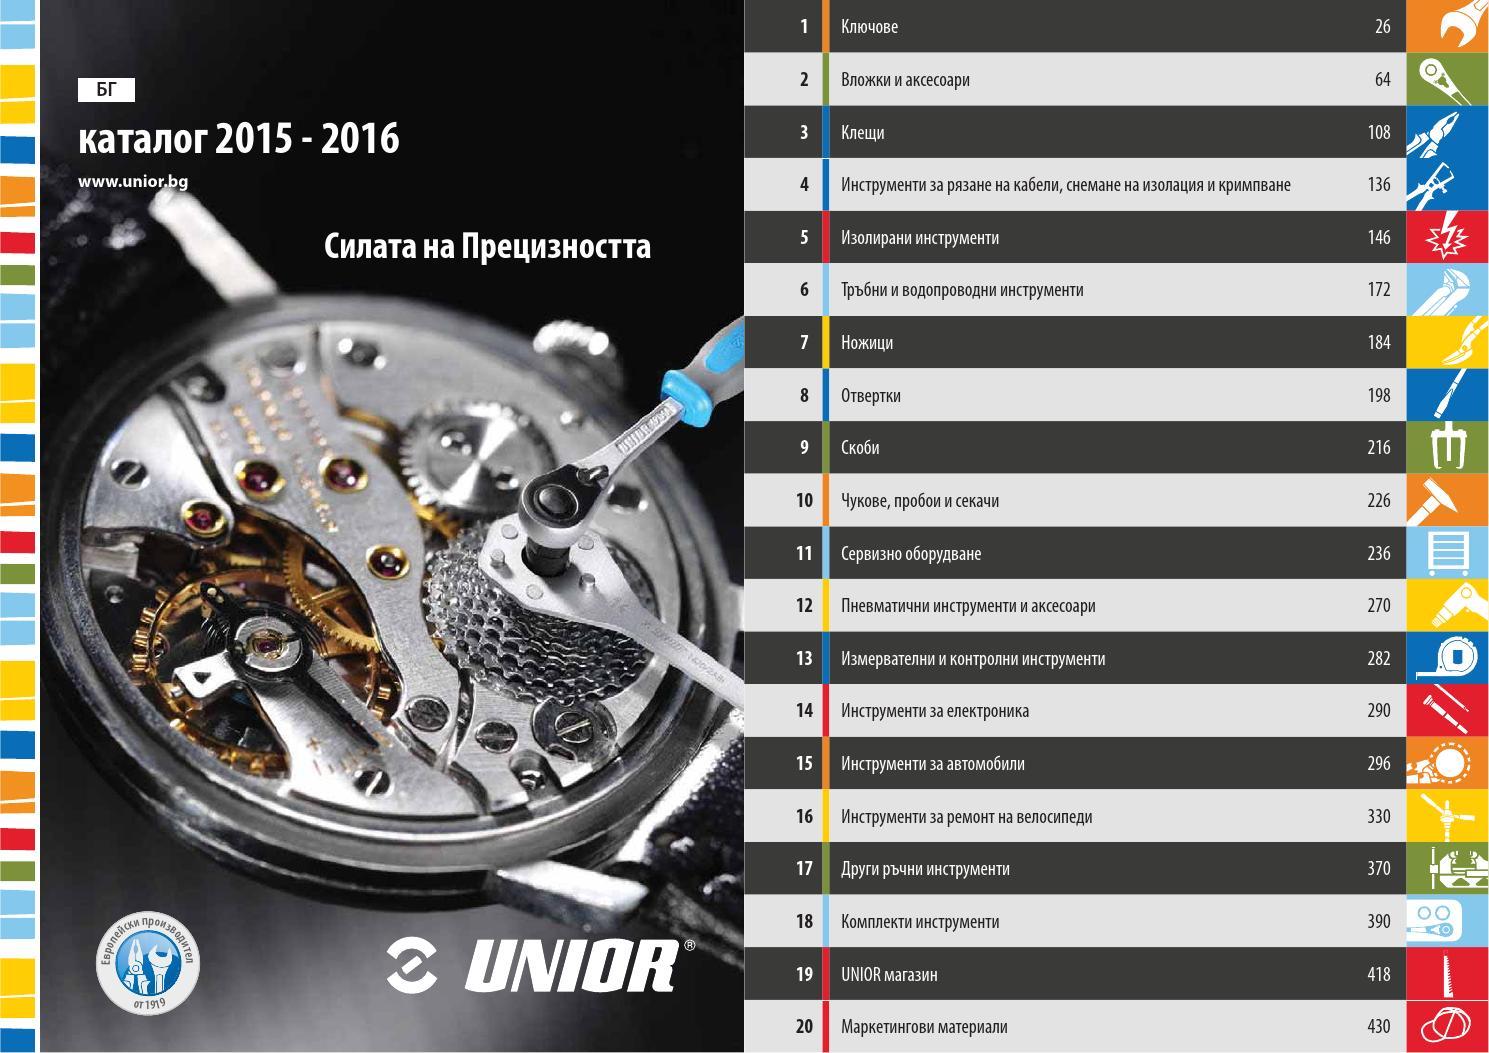 4d0df16b8ad Catalogue 2015 2016 BG by Unior d.d. - issuu